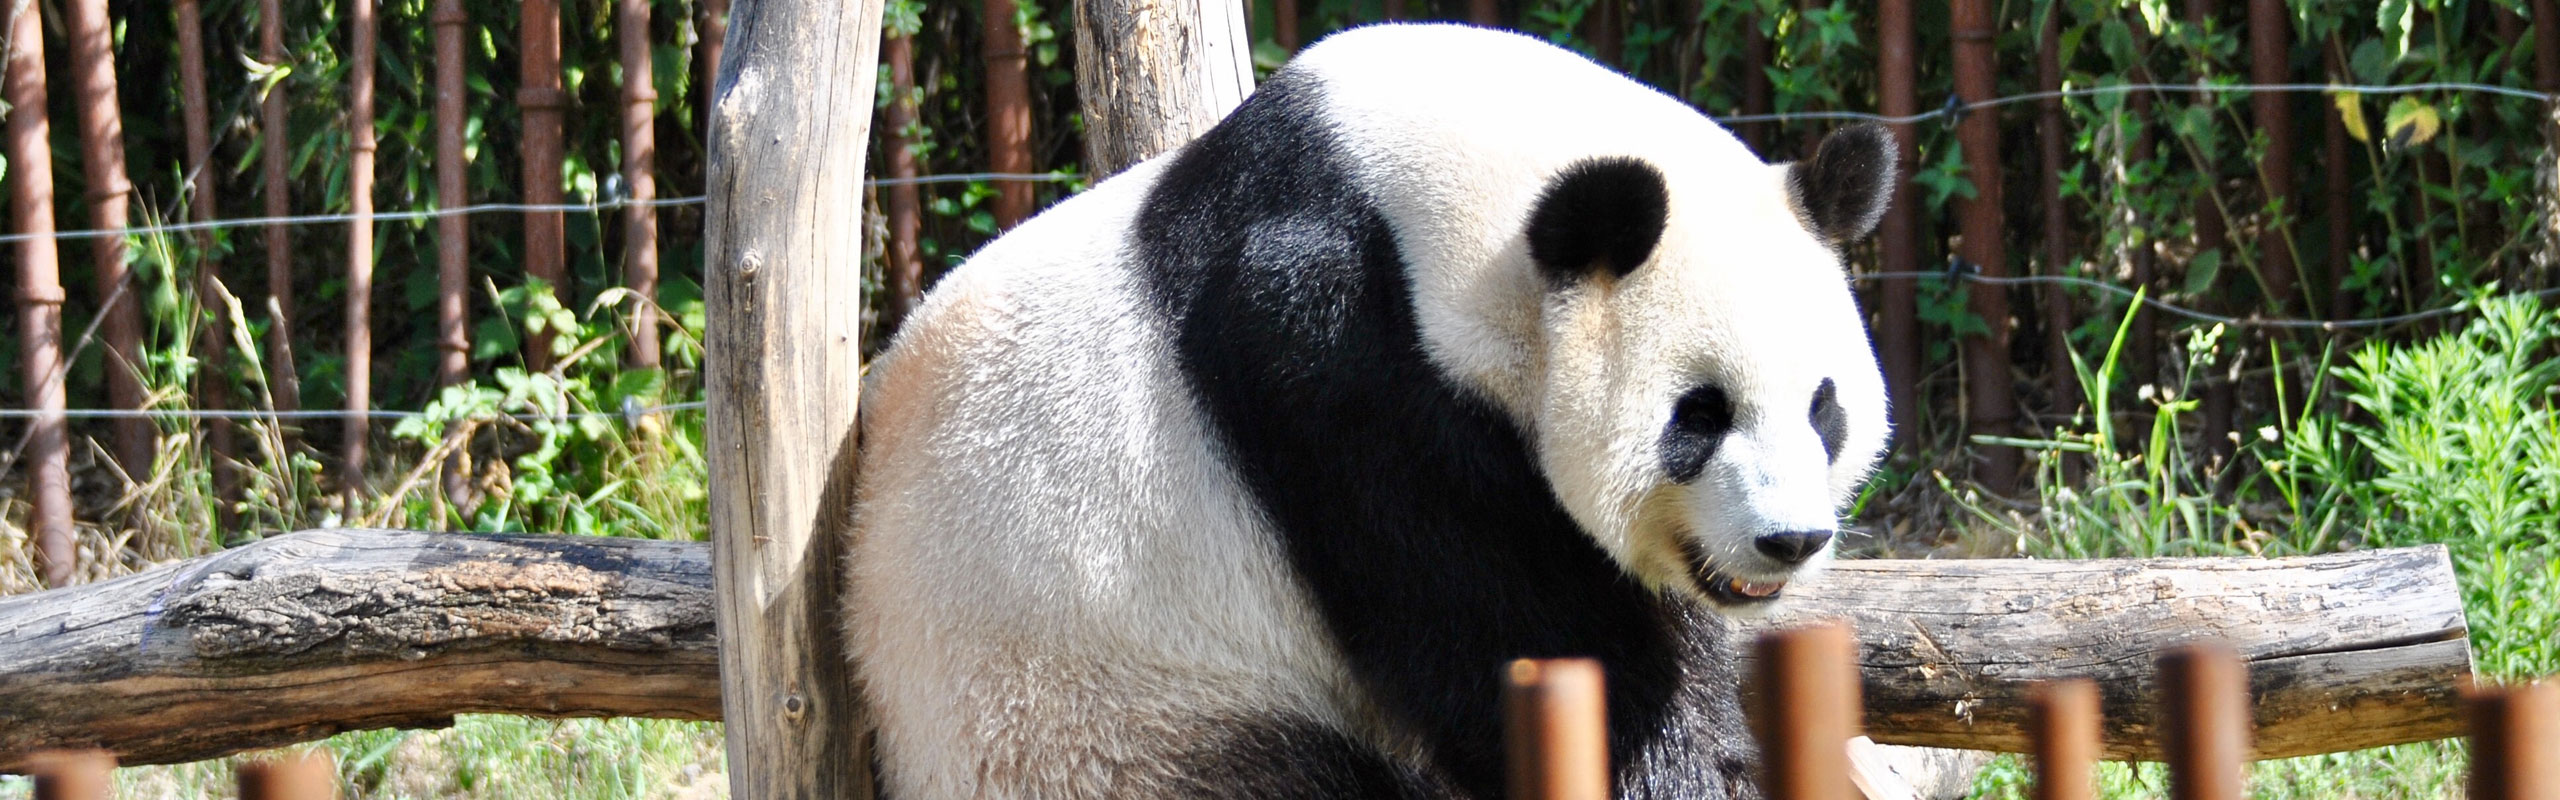 Giant Panda and Giant Buddha Tour